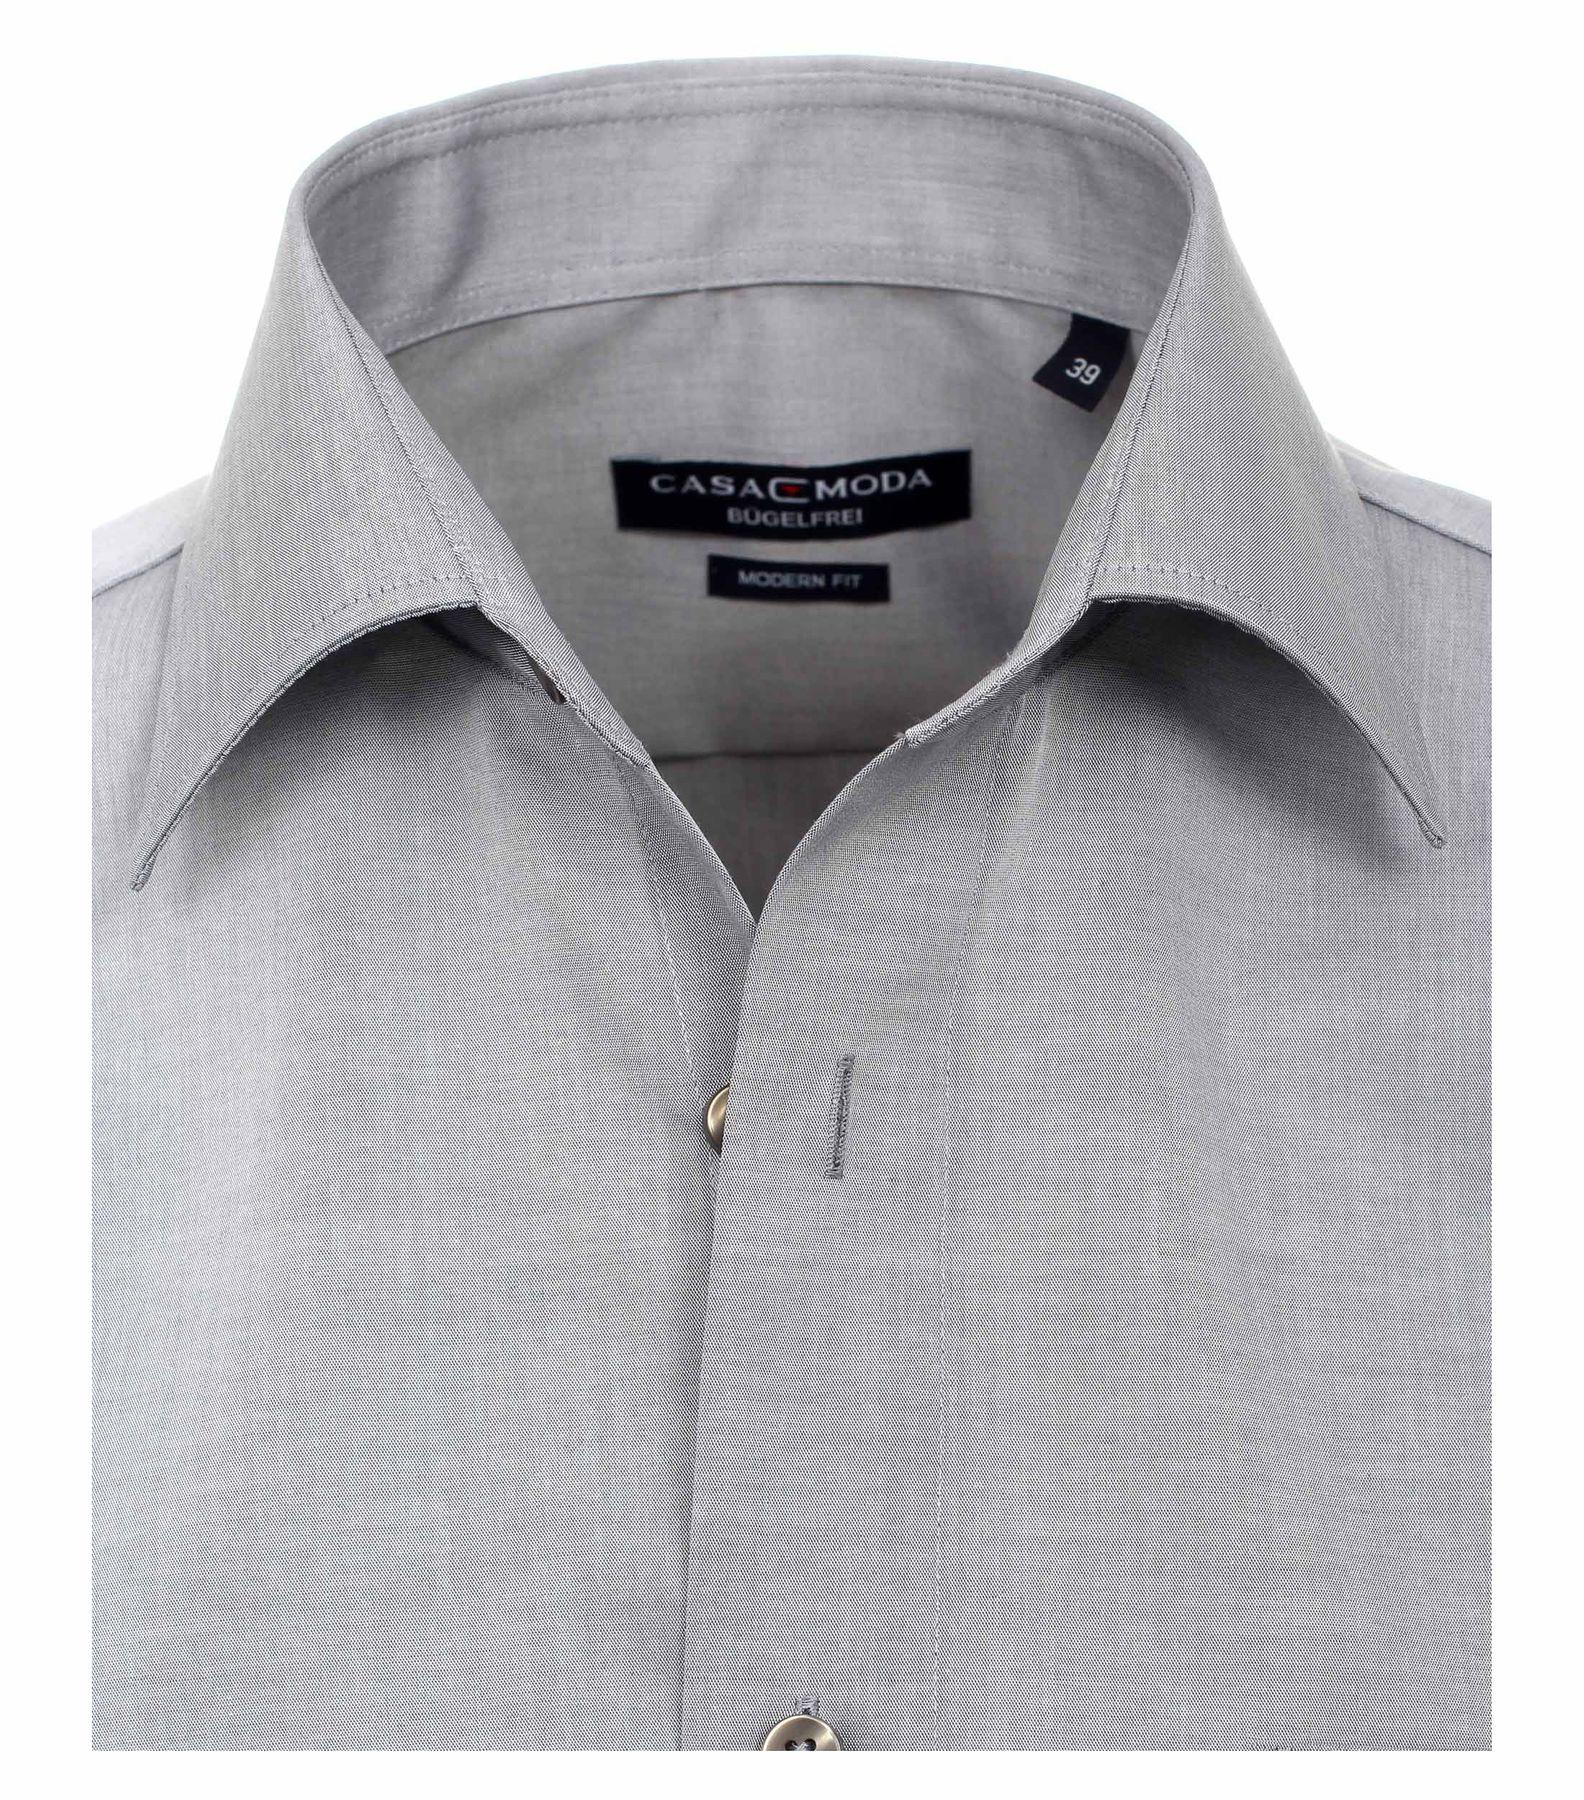 Casamoda - Modern Fit - Bügelfreies Herren Business Langarm Hemd verschiedene Farben (006560A) – Bild 3